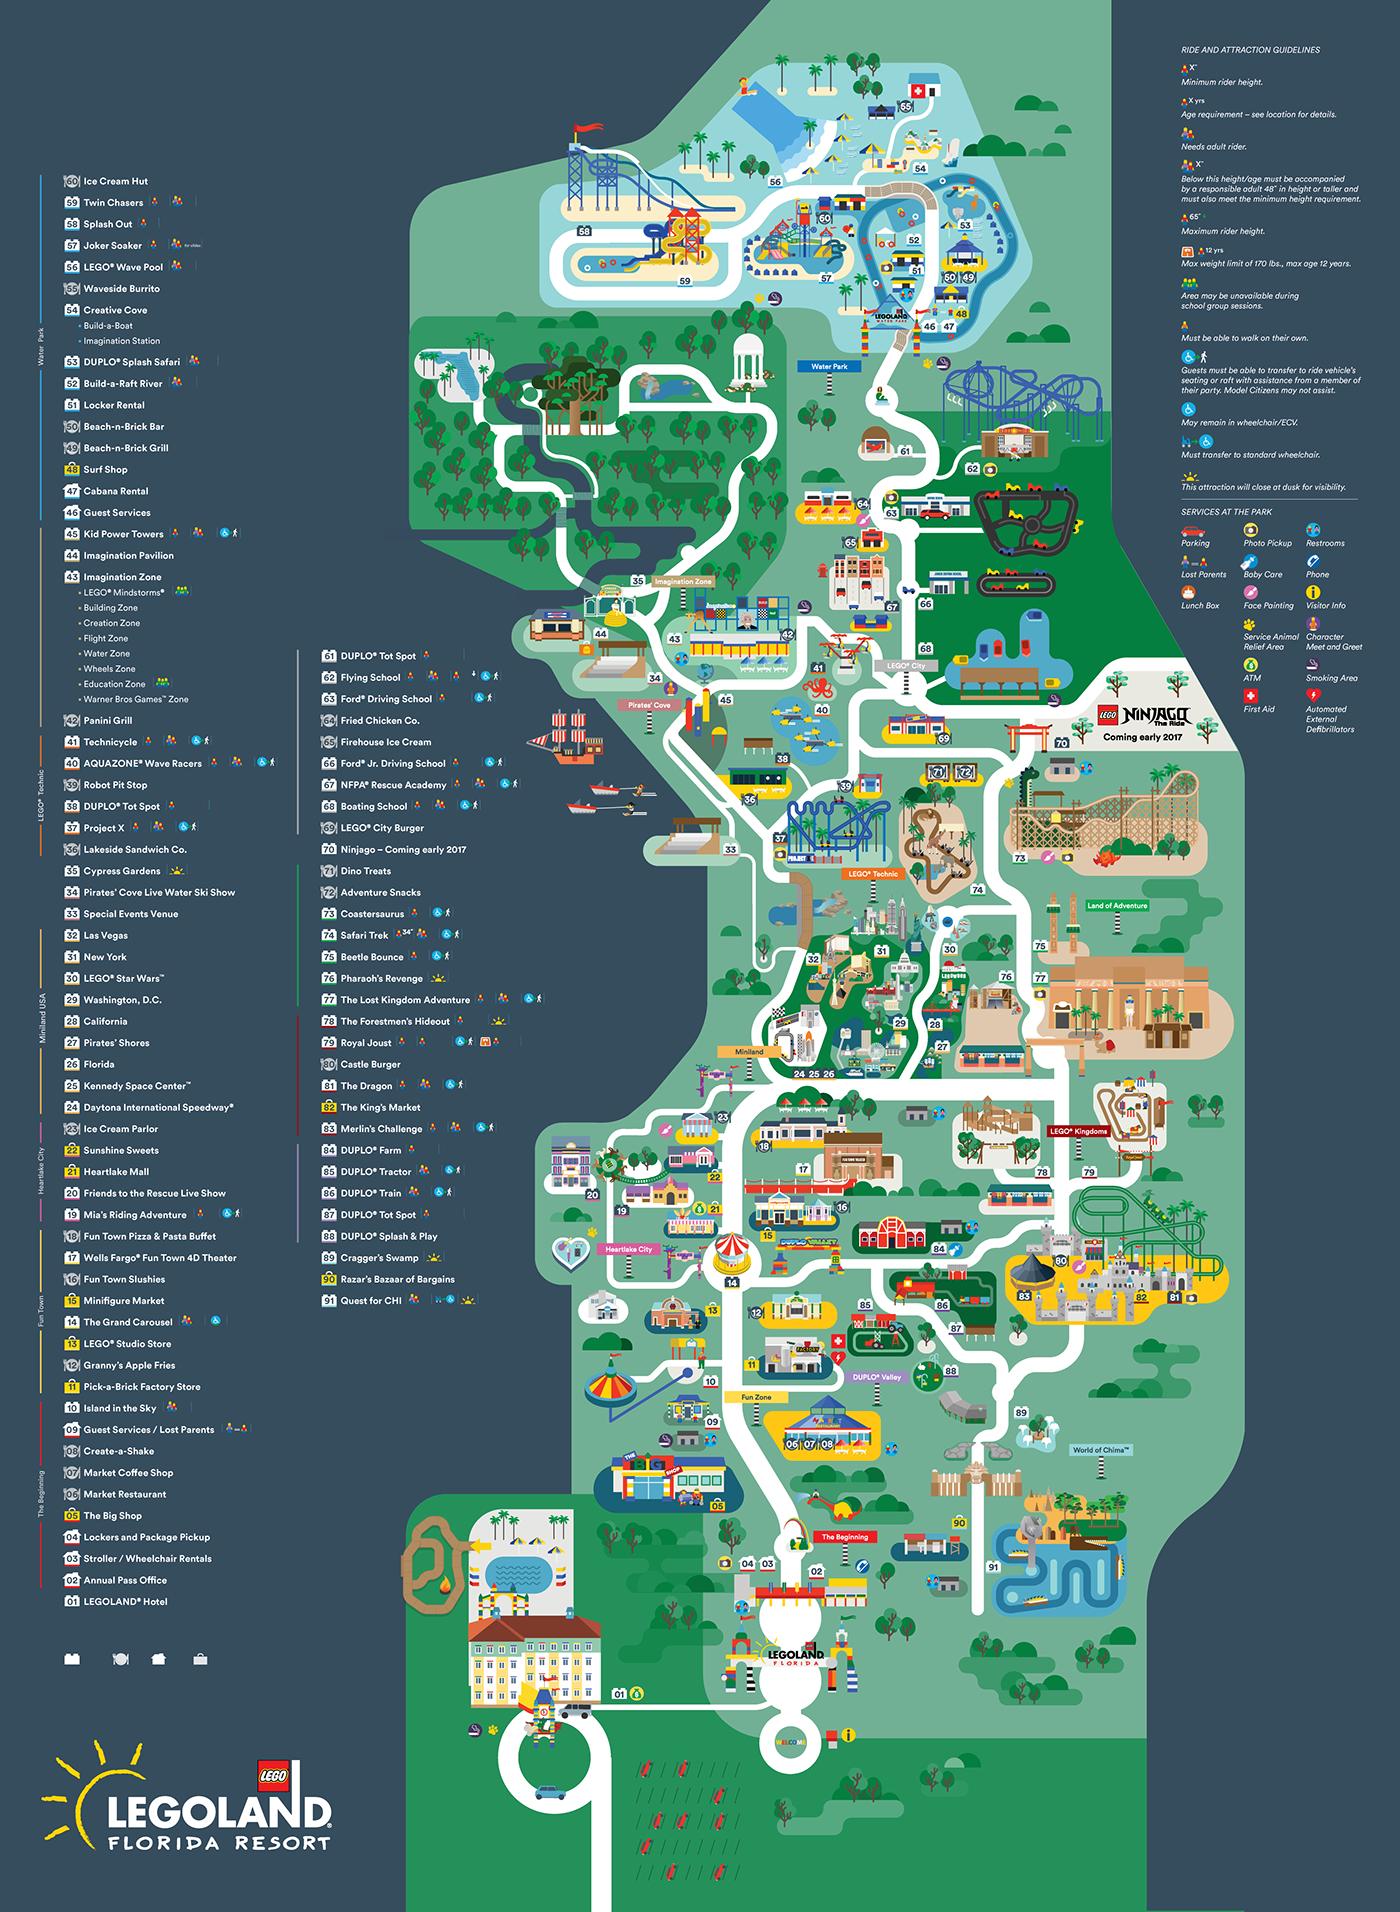 Map Of Legoland Florida Legoland Florida map 2016 on Behance | Legoland florida, Legoland